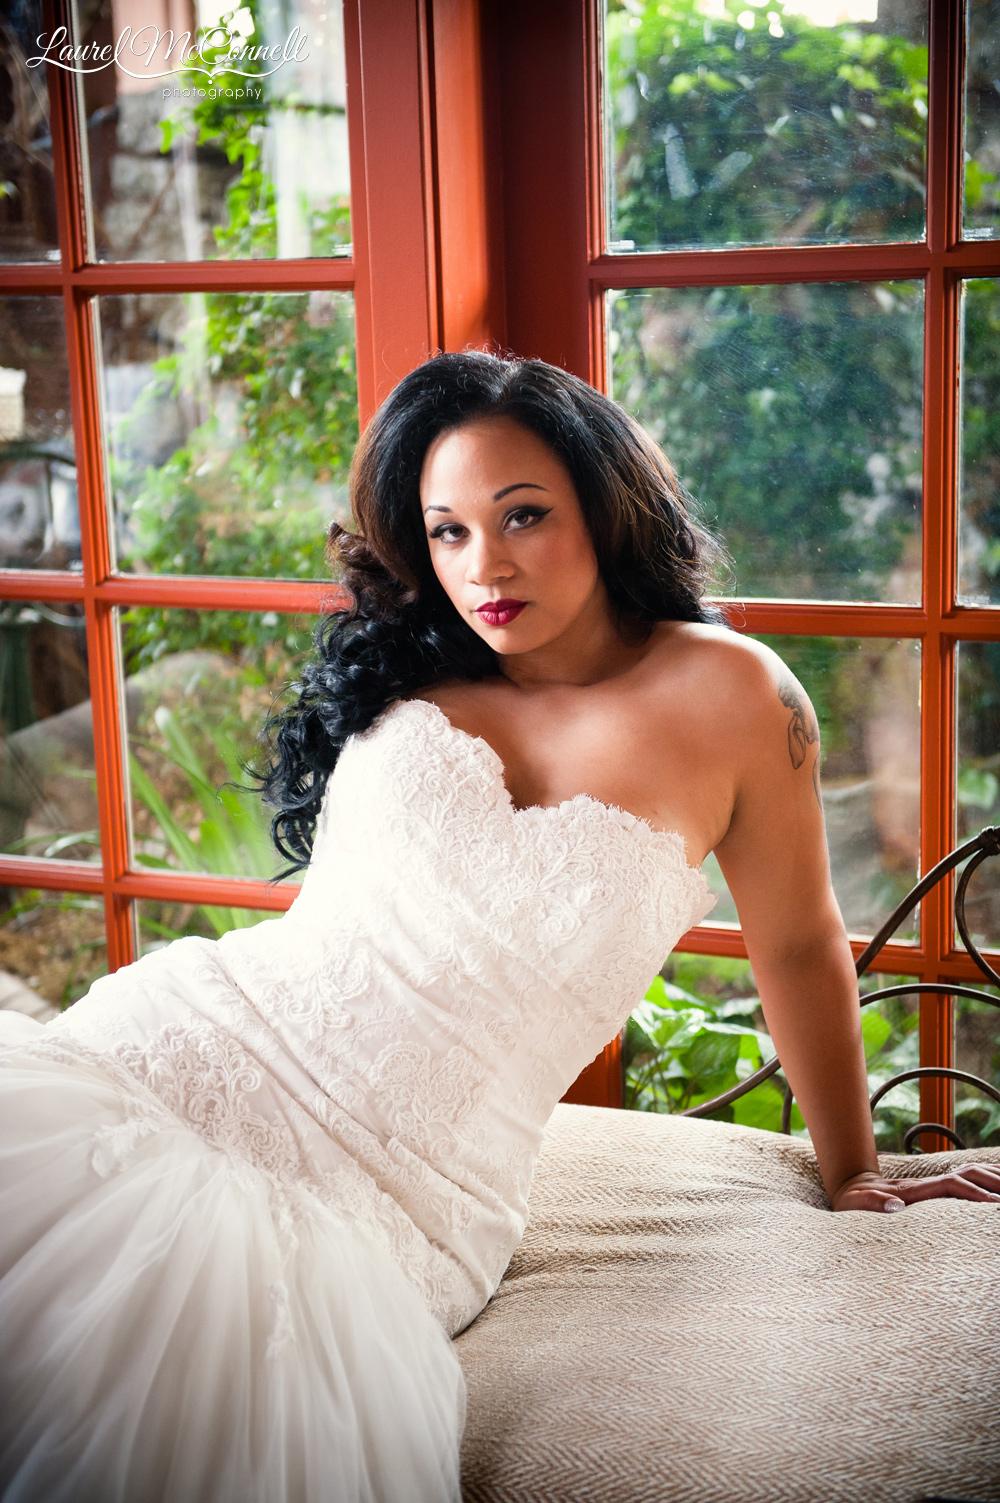 Gorgeous bridal portraits Seattle wedding photographer.